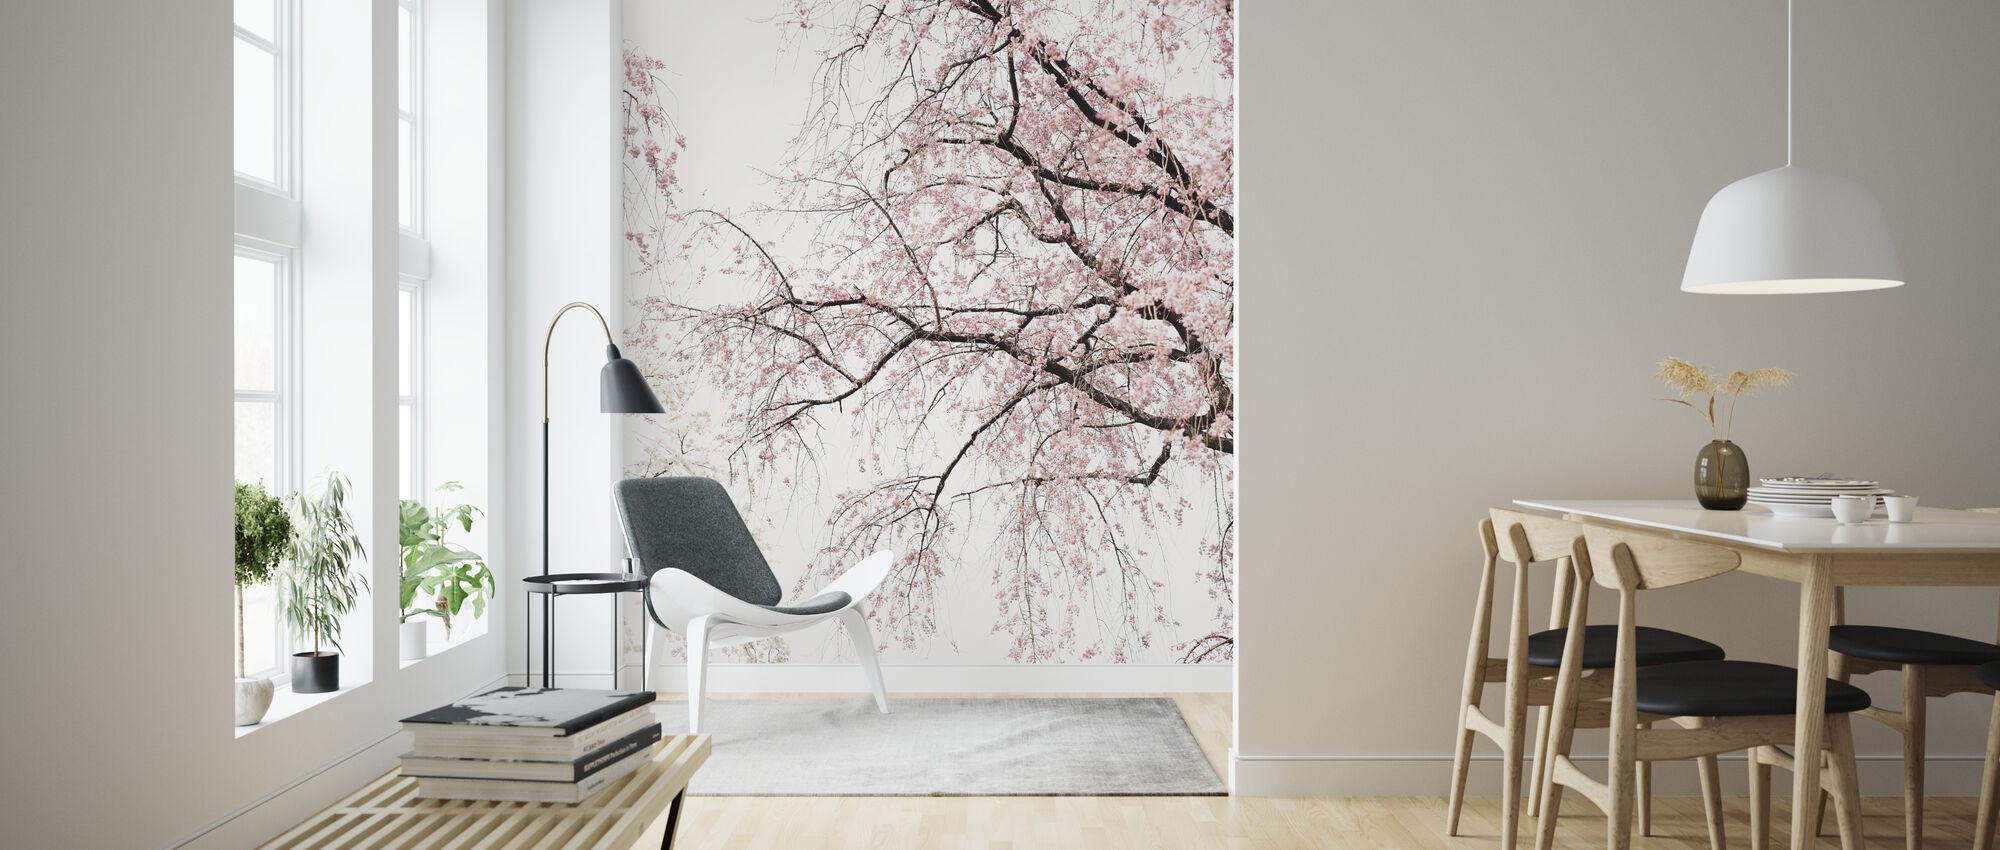 Cherry Blossoms - Wallpaper - Living Room